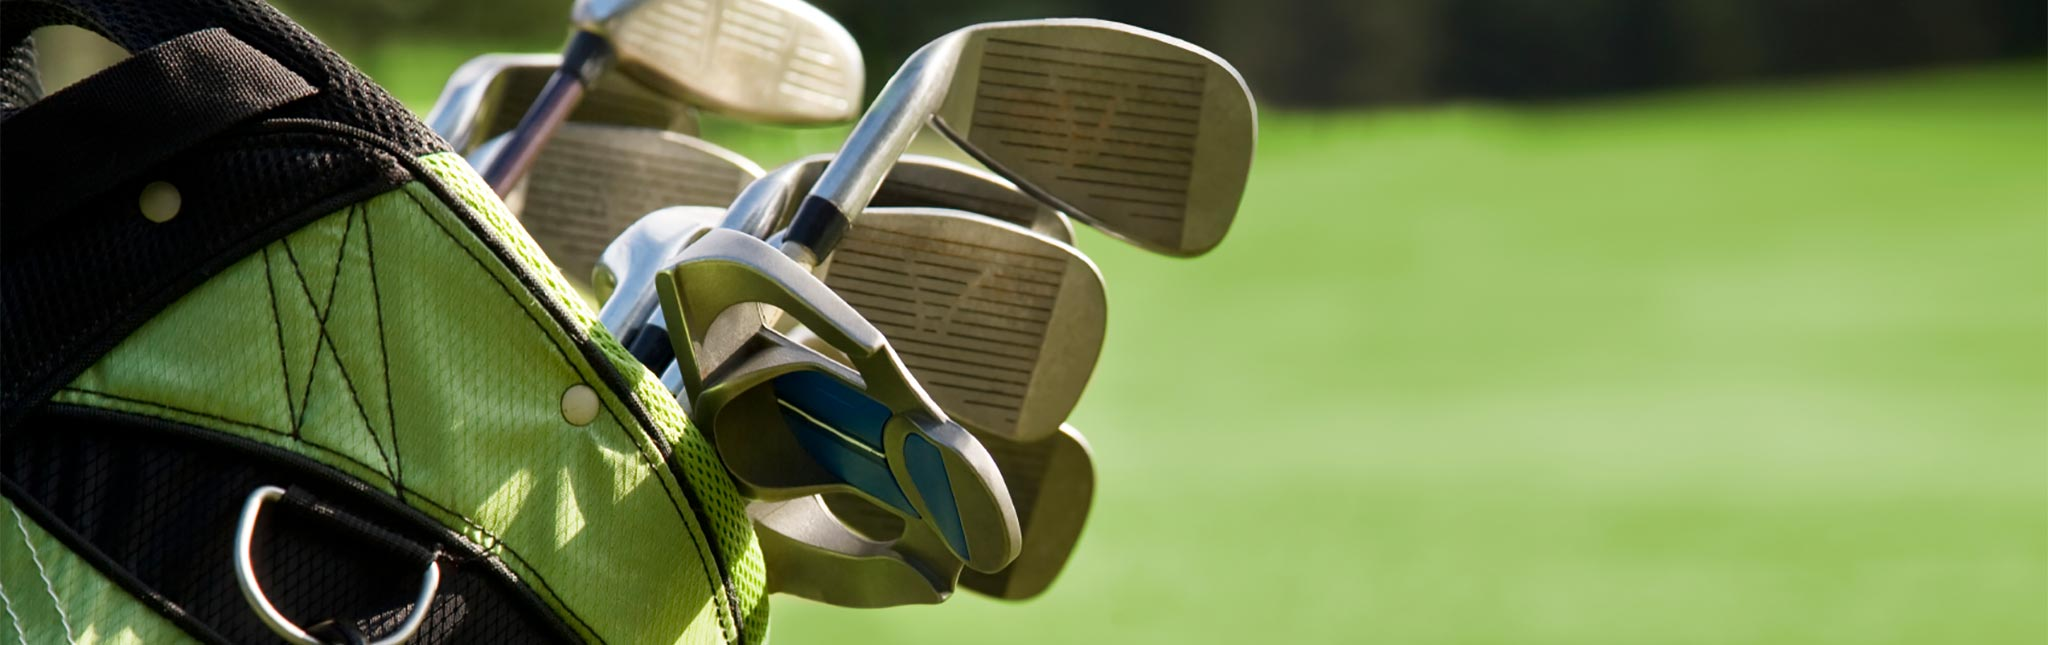 golf_bag2048x645.jpg